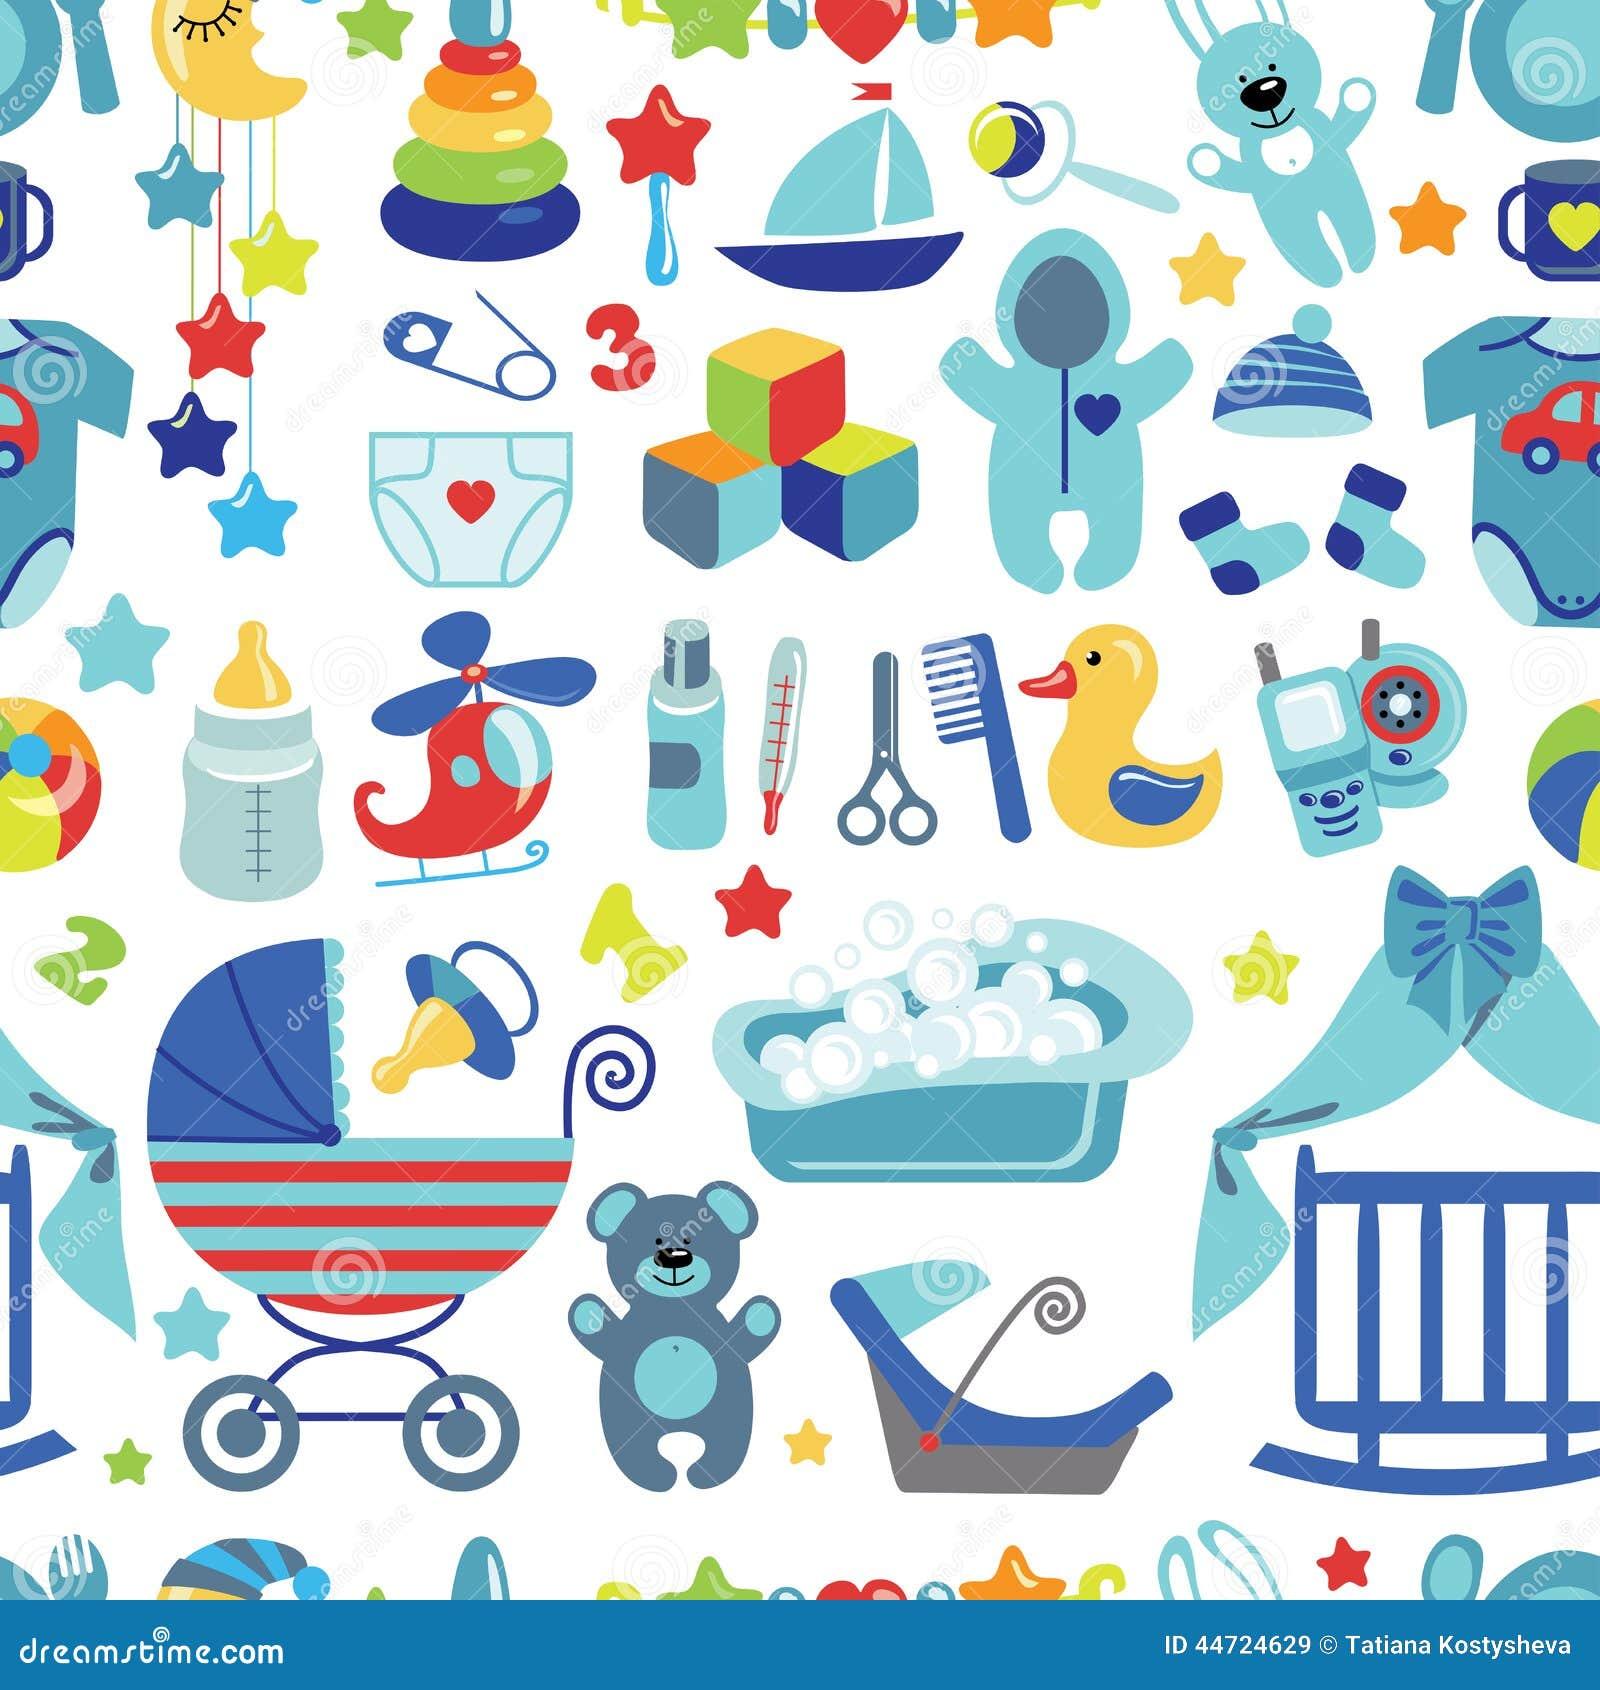 33cfe17d2 Newborn Baby Boy Seamless Pattern Stock Vector - Illustration of ...